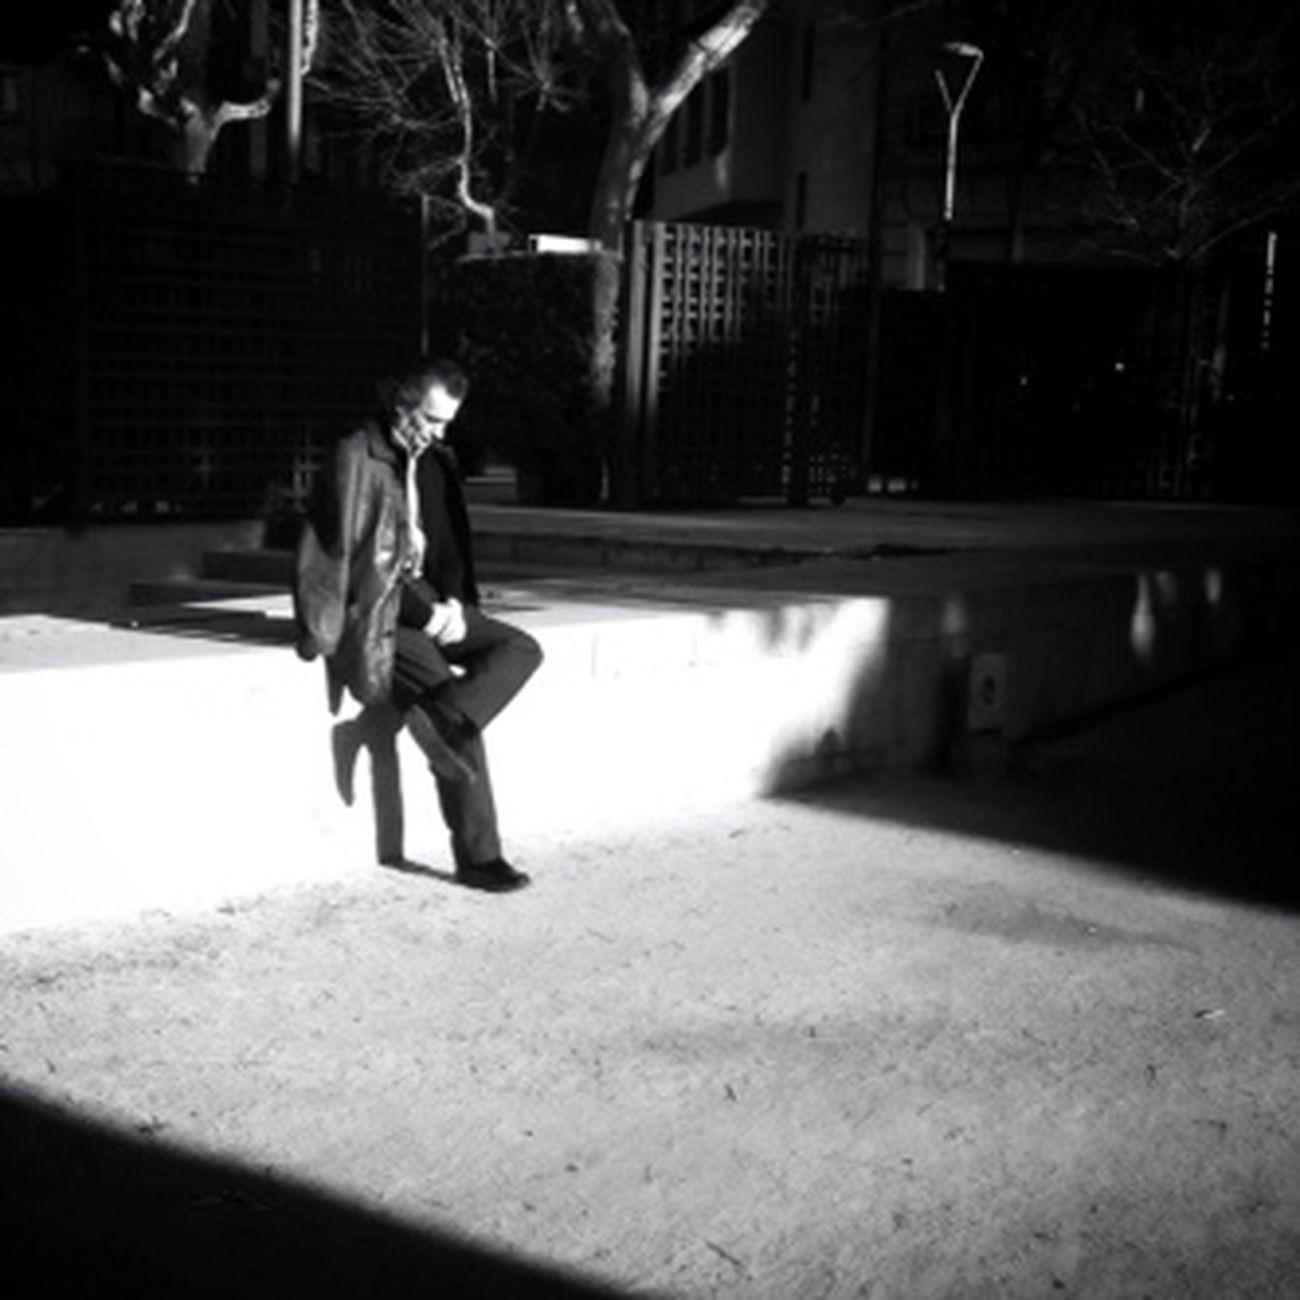 Sunbathing Shootermag Grryo Streetphotography NEM Street NEM Black&white Mob Fiction Enjoying The Sun